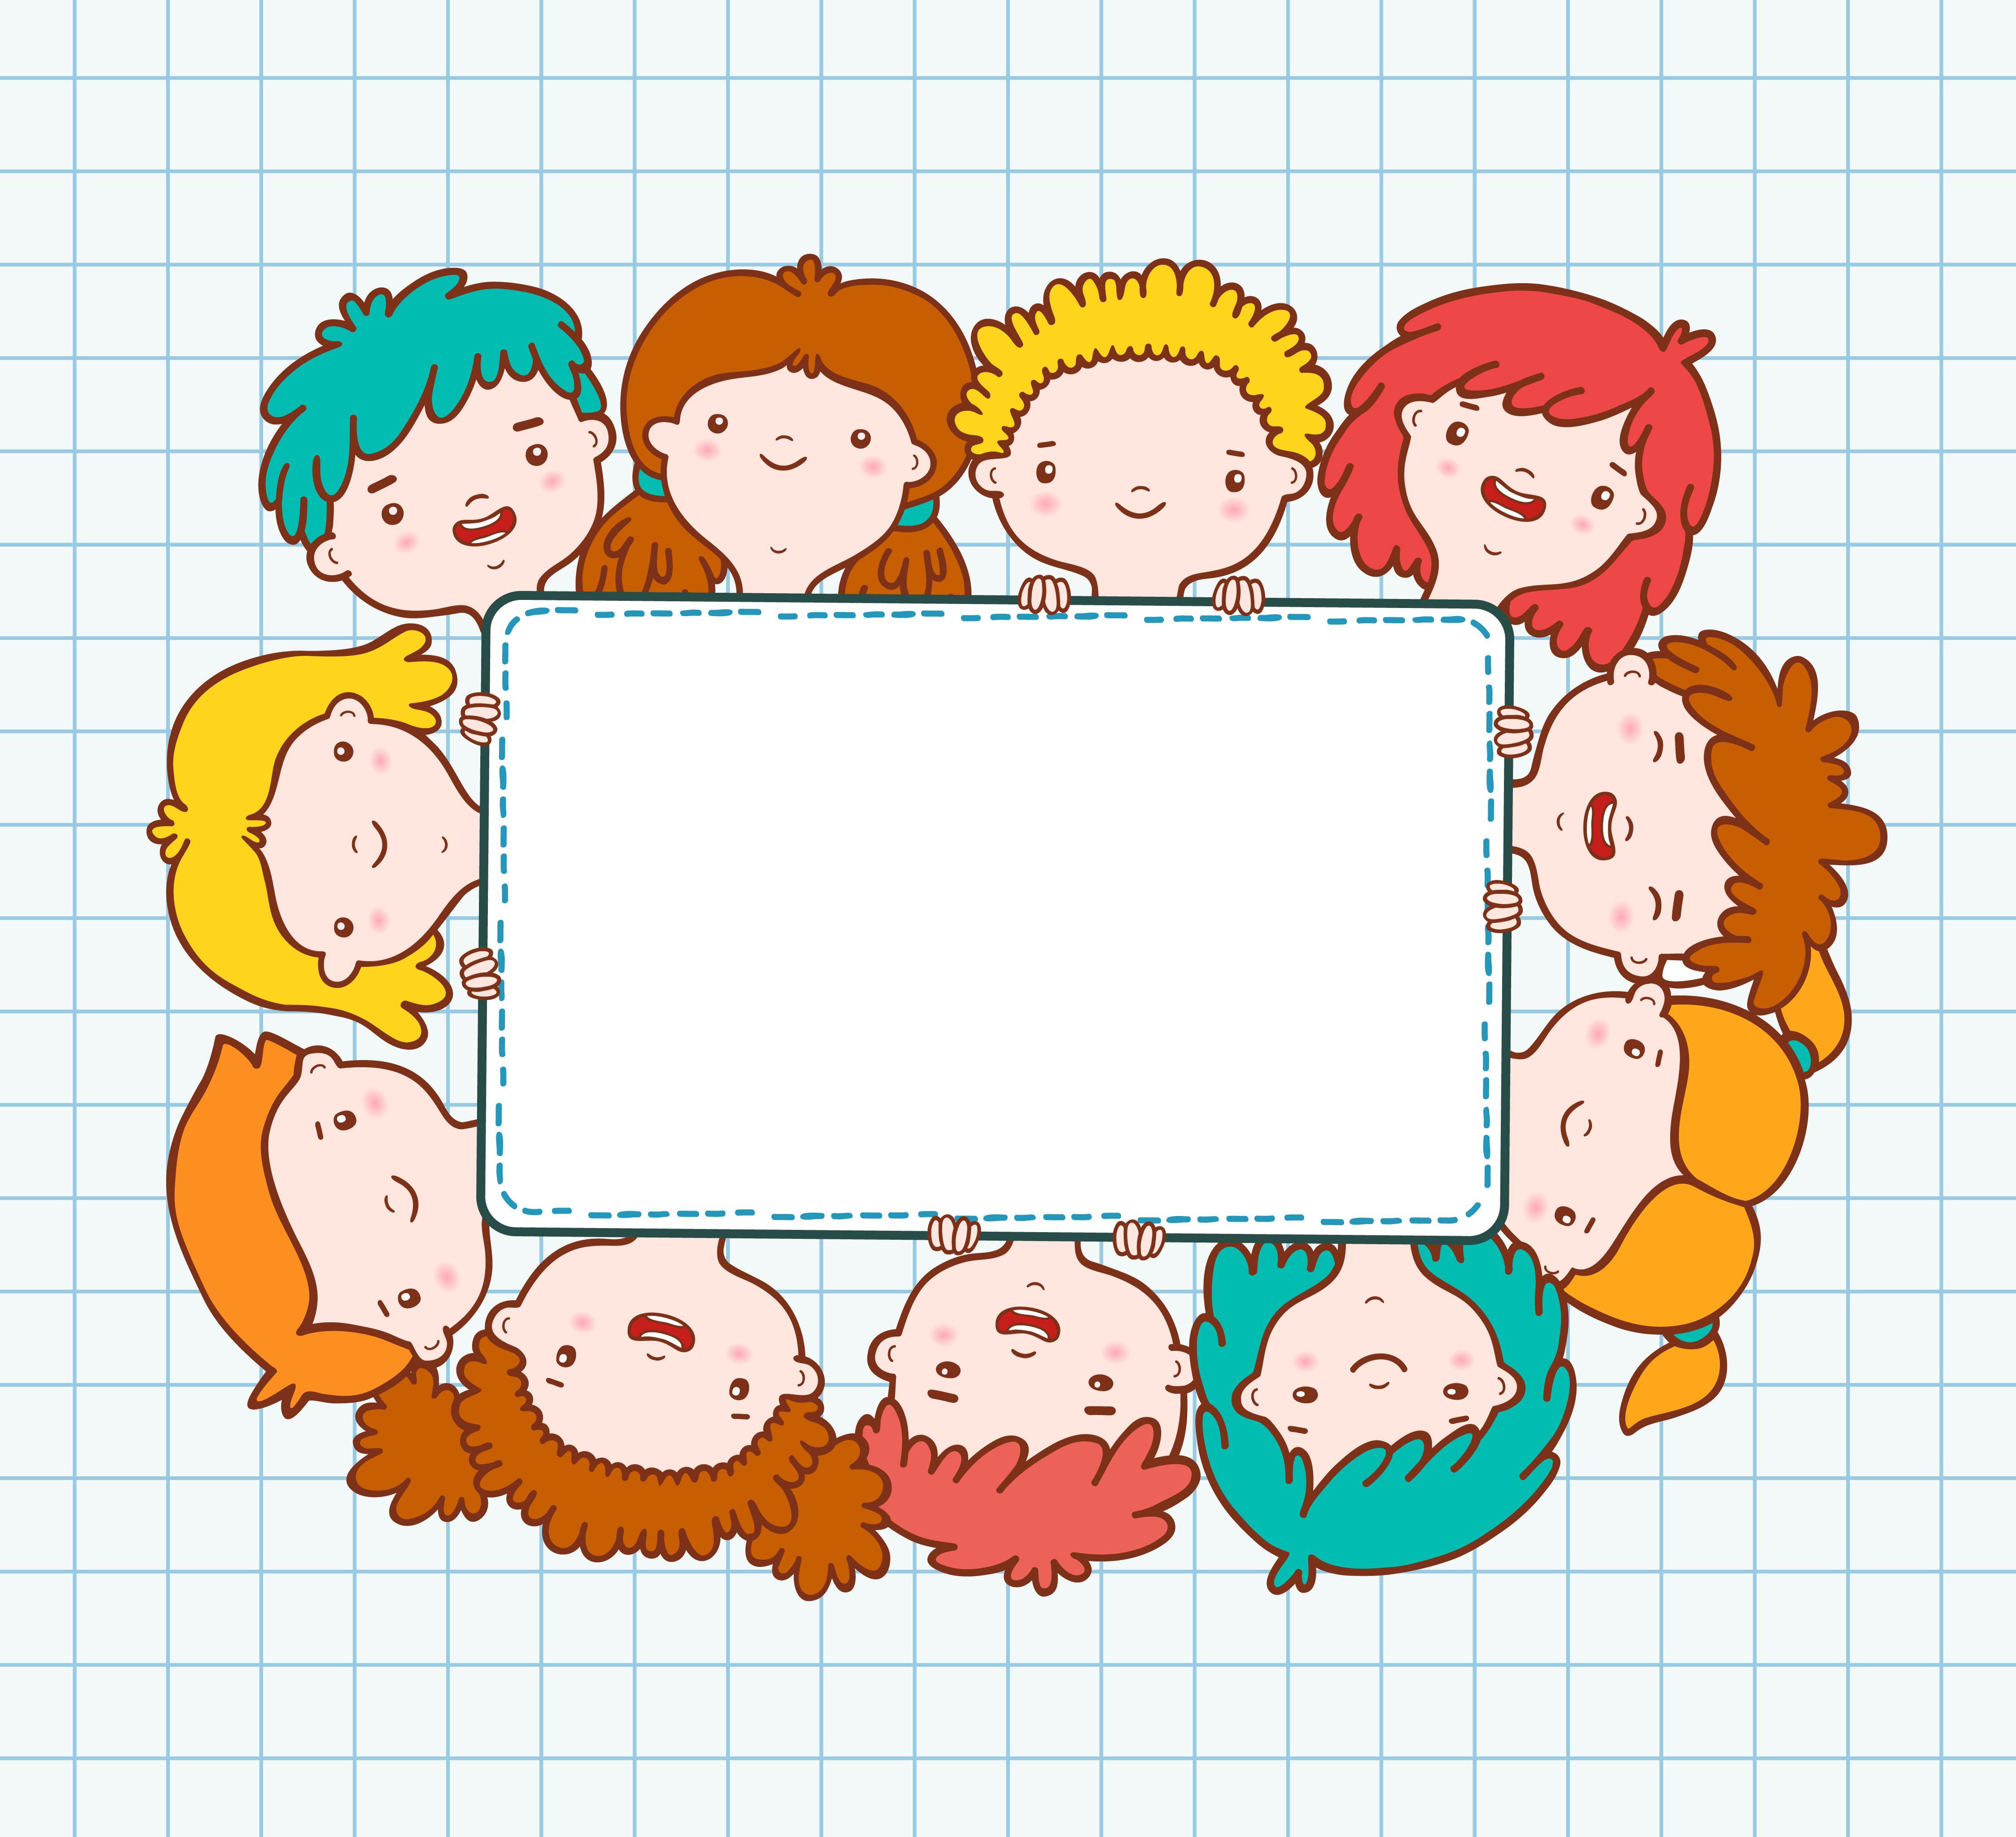 Doodle kids blank frame - Download Free Vectors, Clipart ...